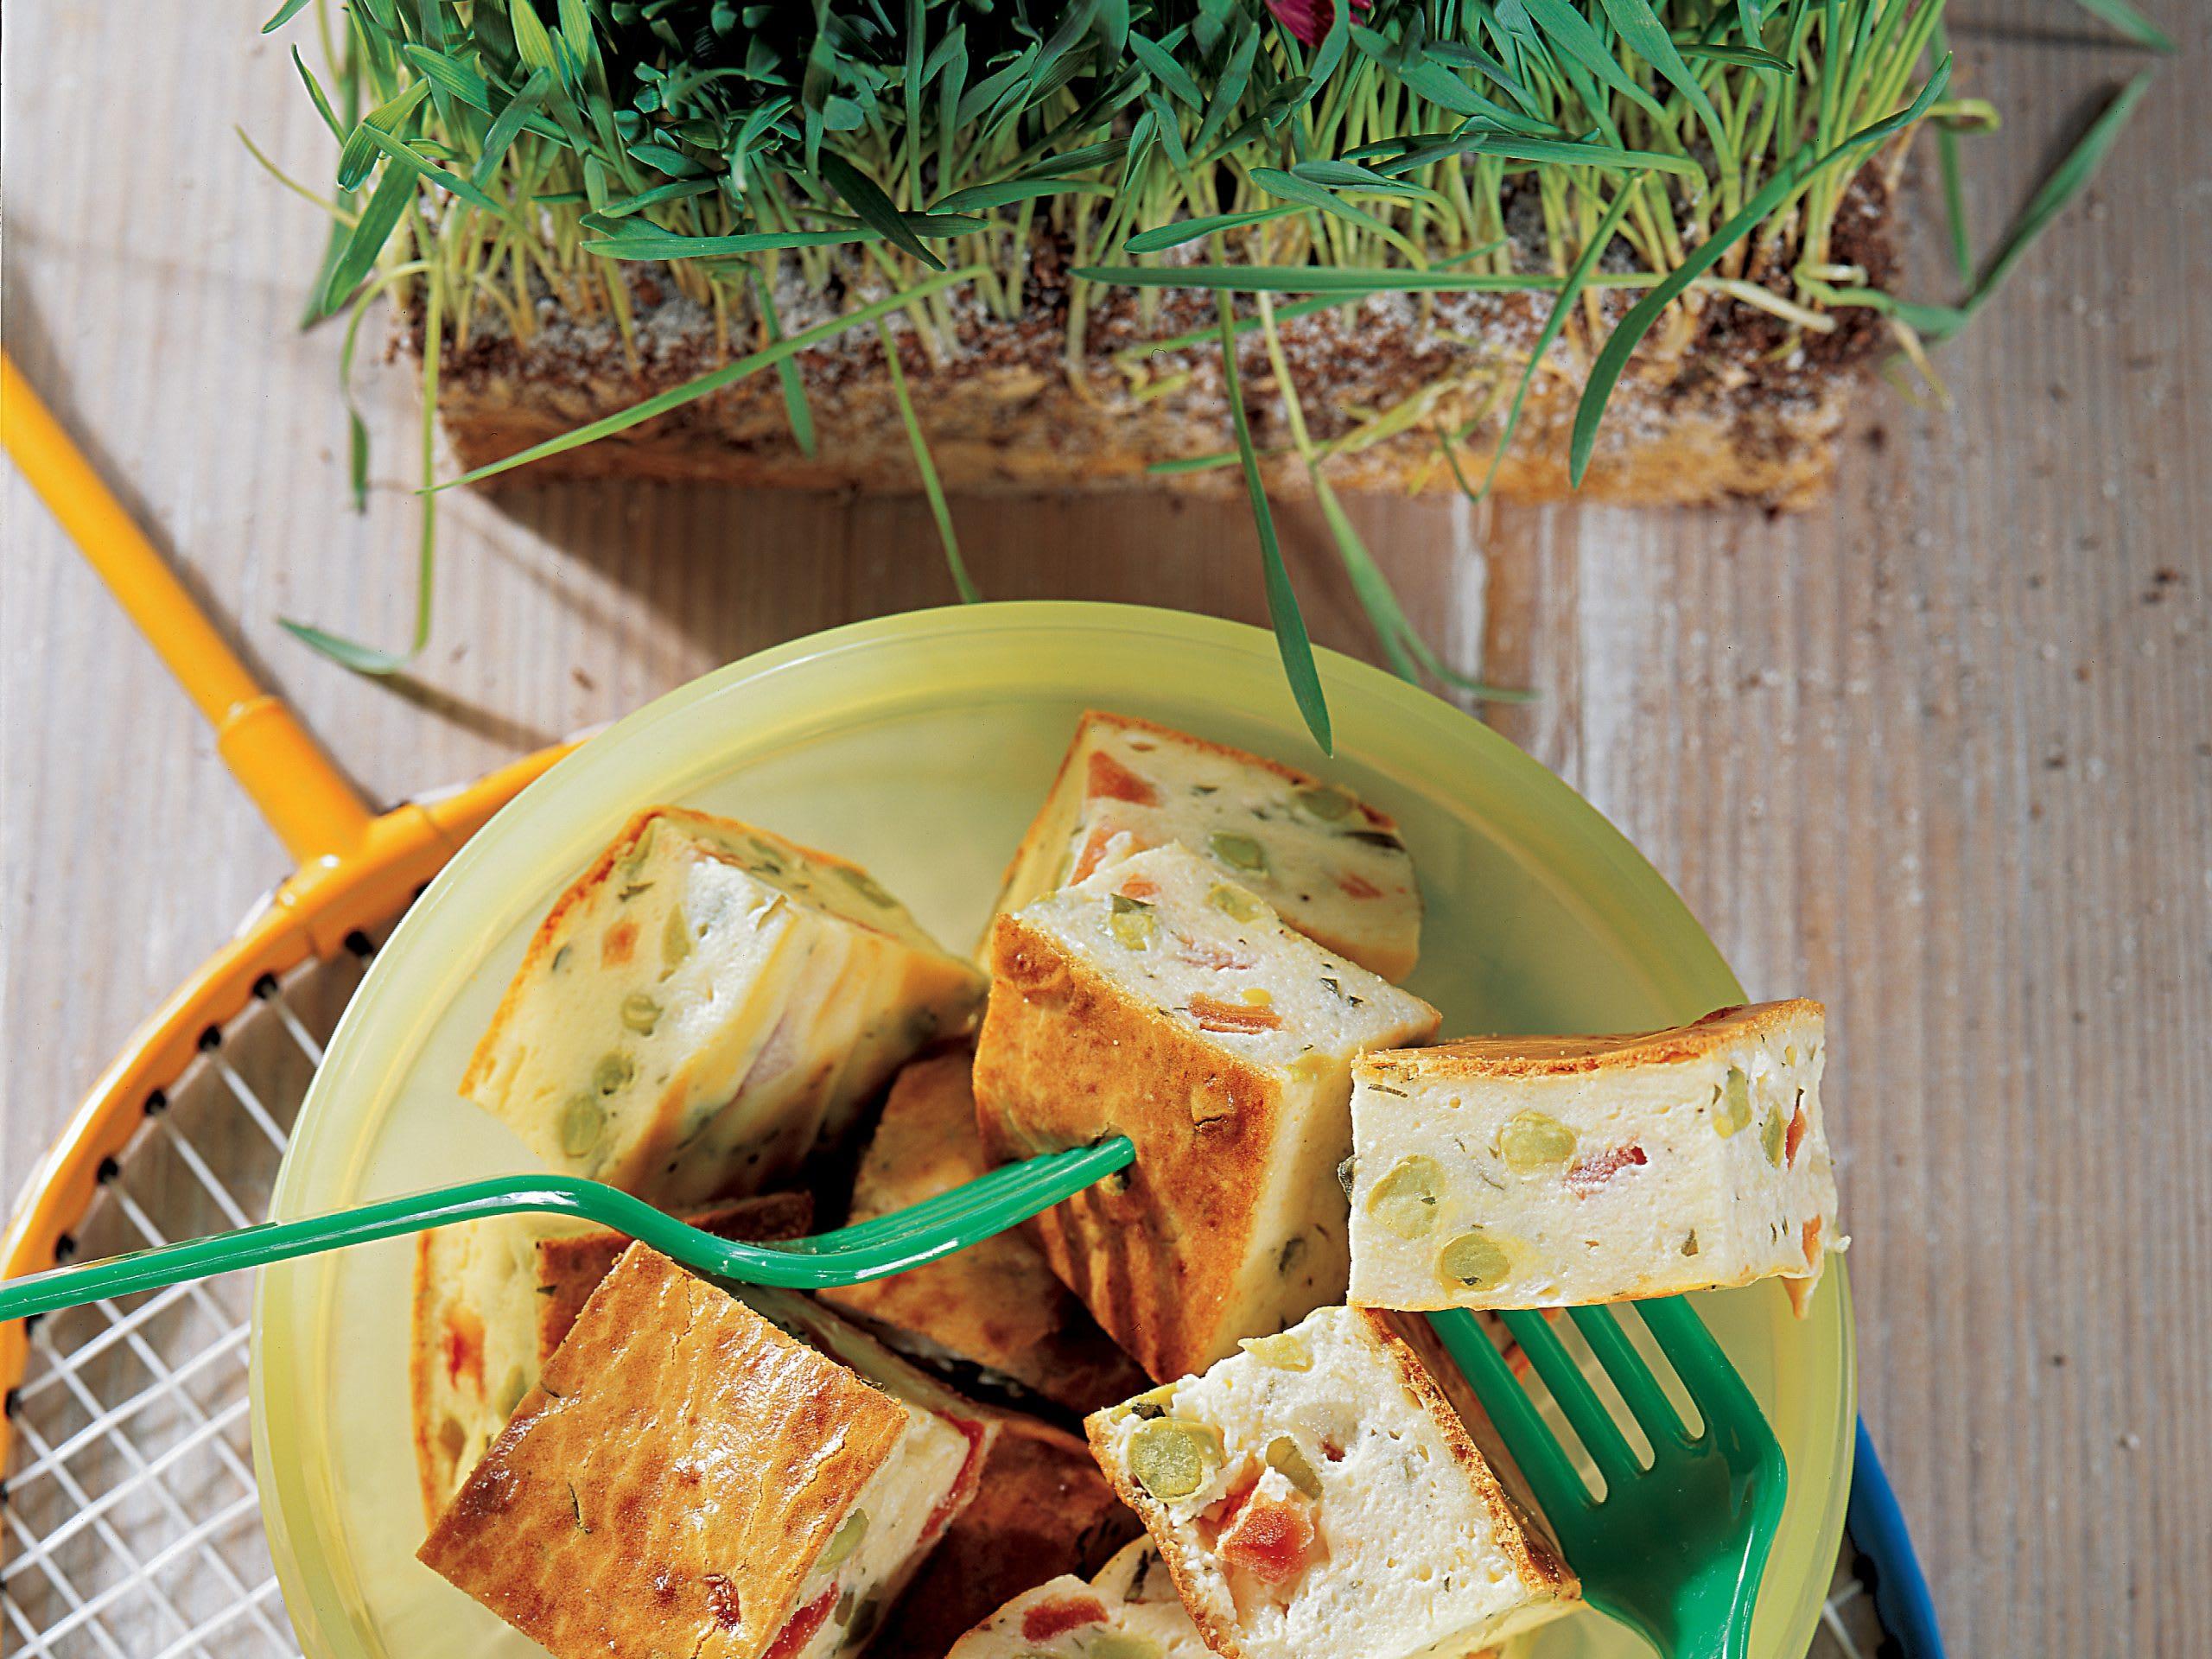 Frischkäse-Gemüse-Schnitten